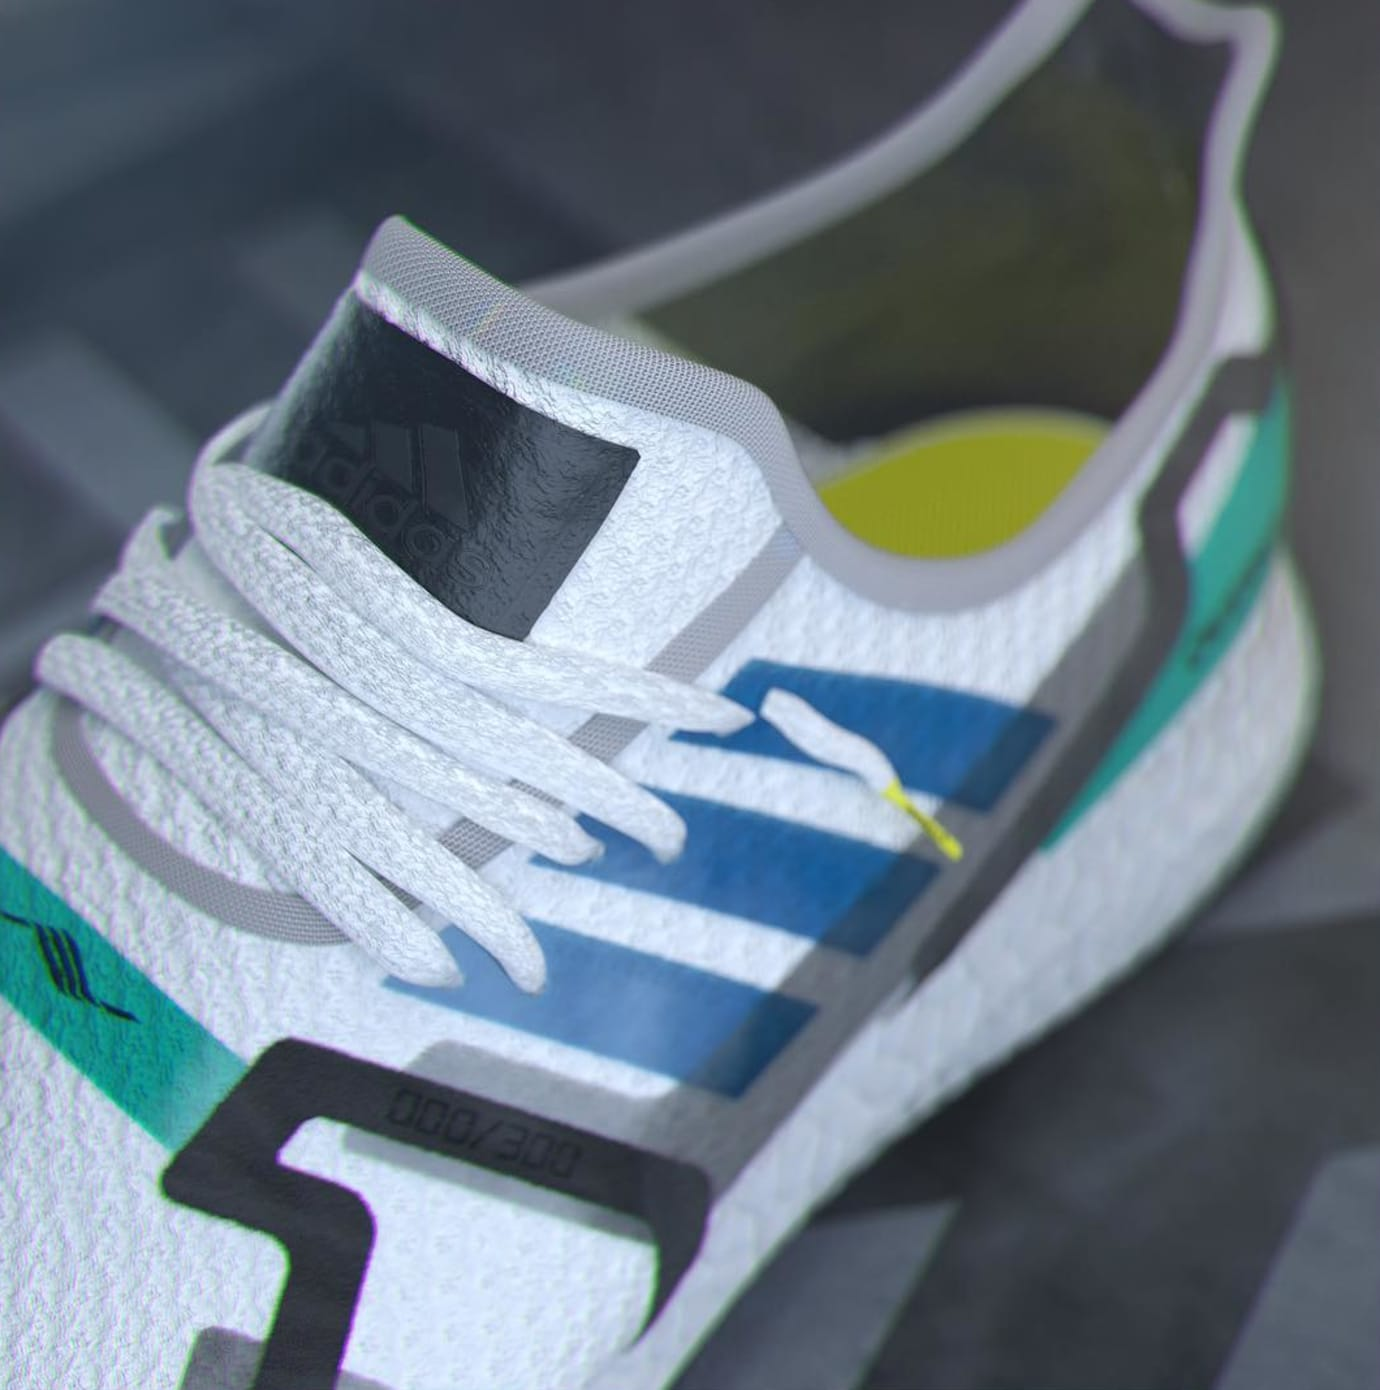 promo code 3a21b e5dd4 Overkill x Adidas AM4 Release Date | Sole Collector